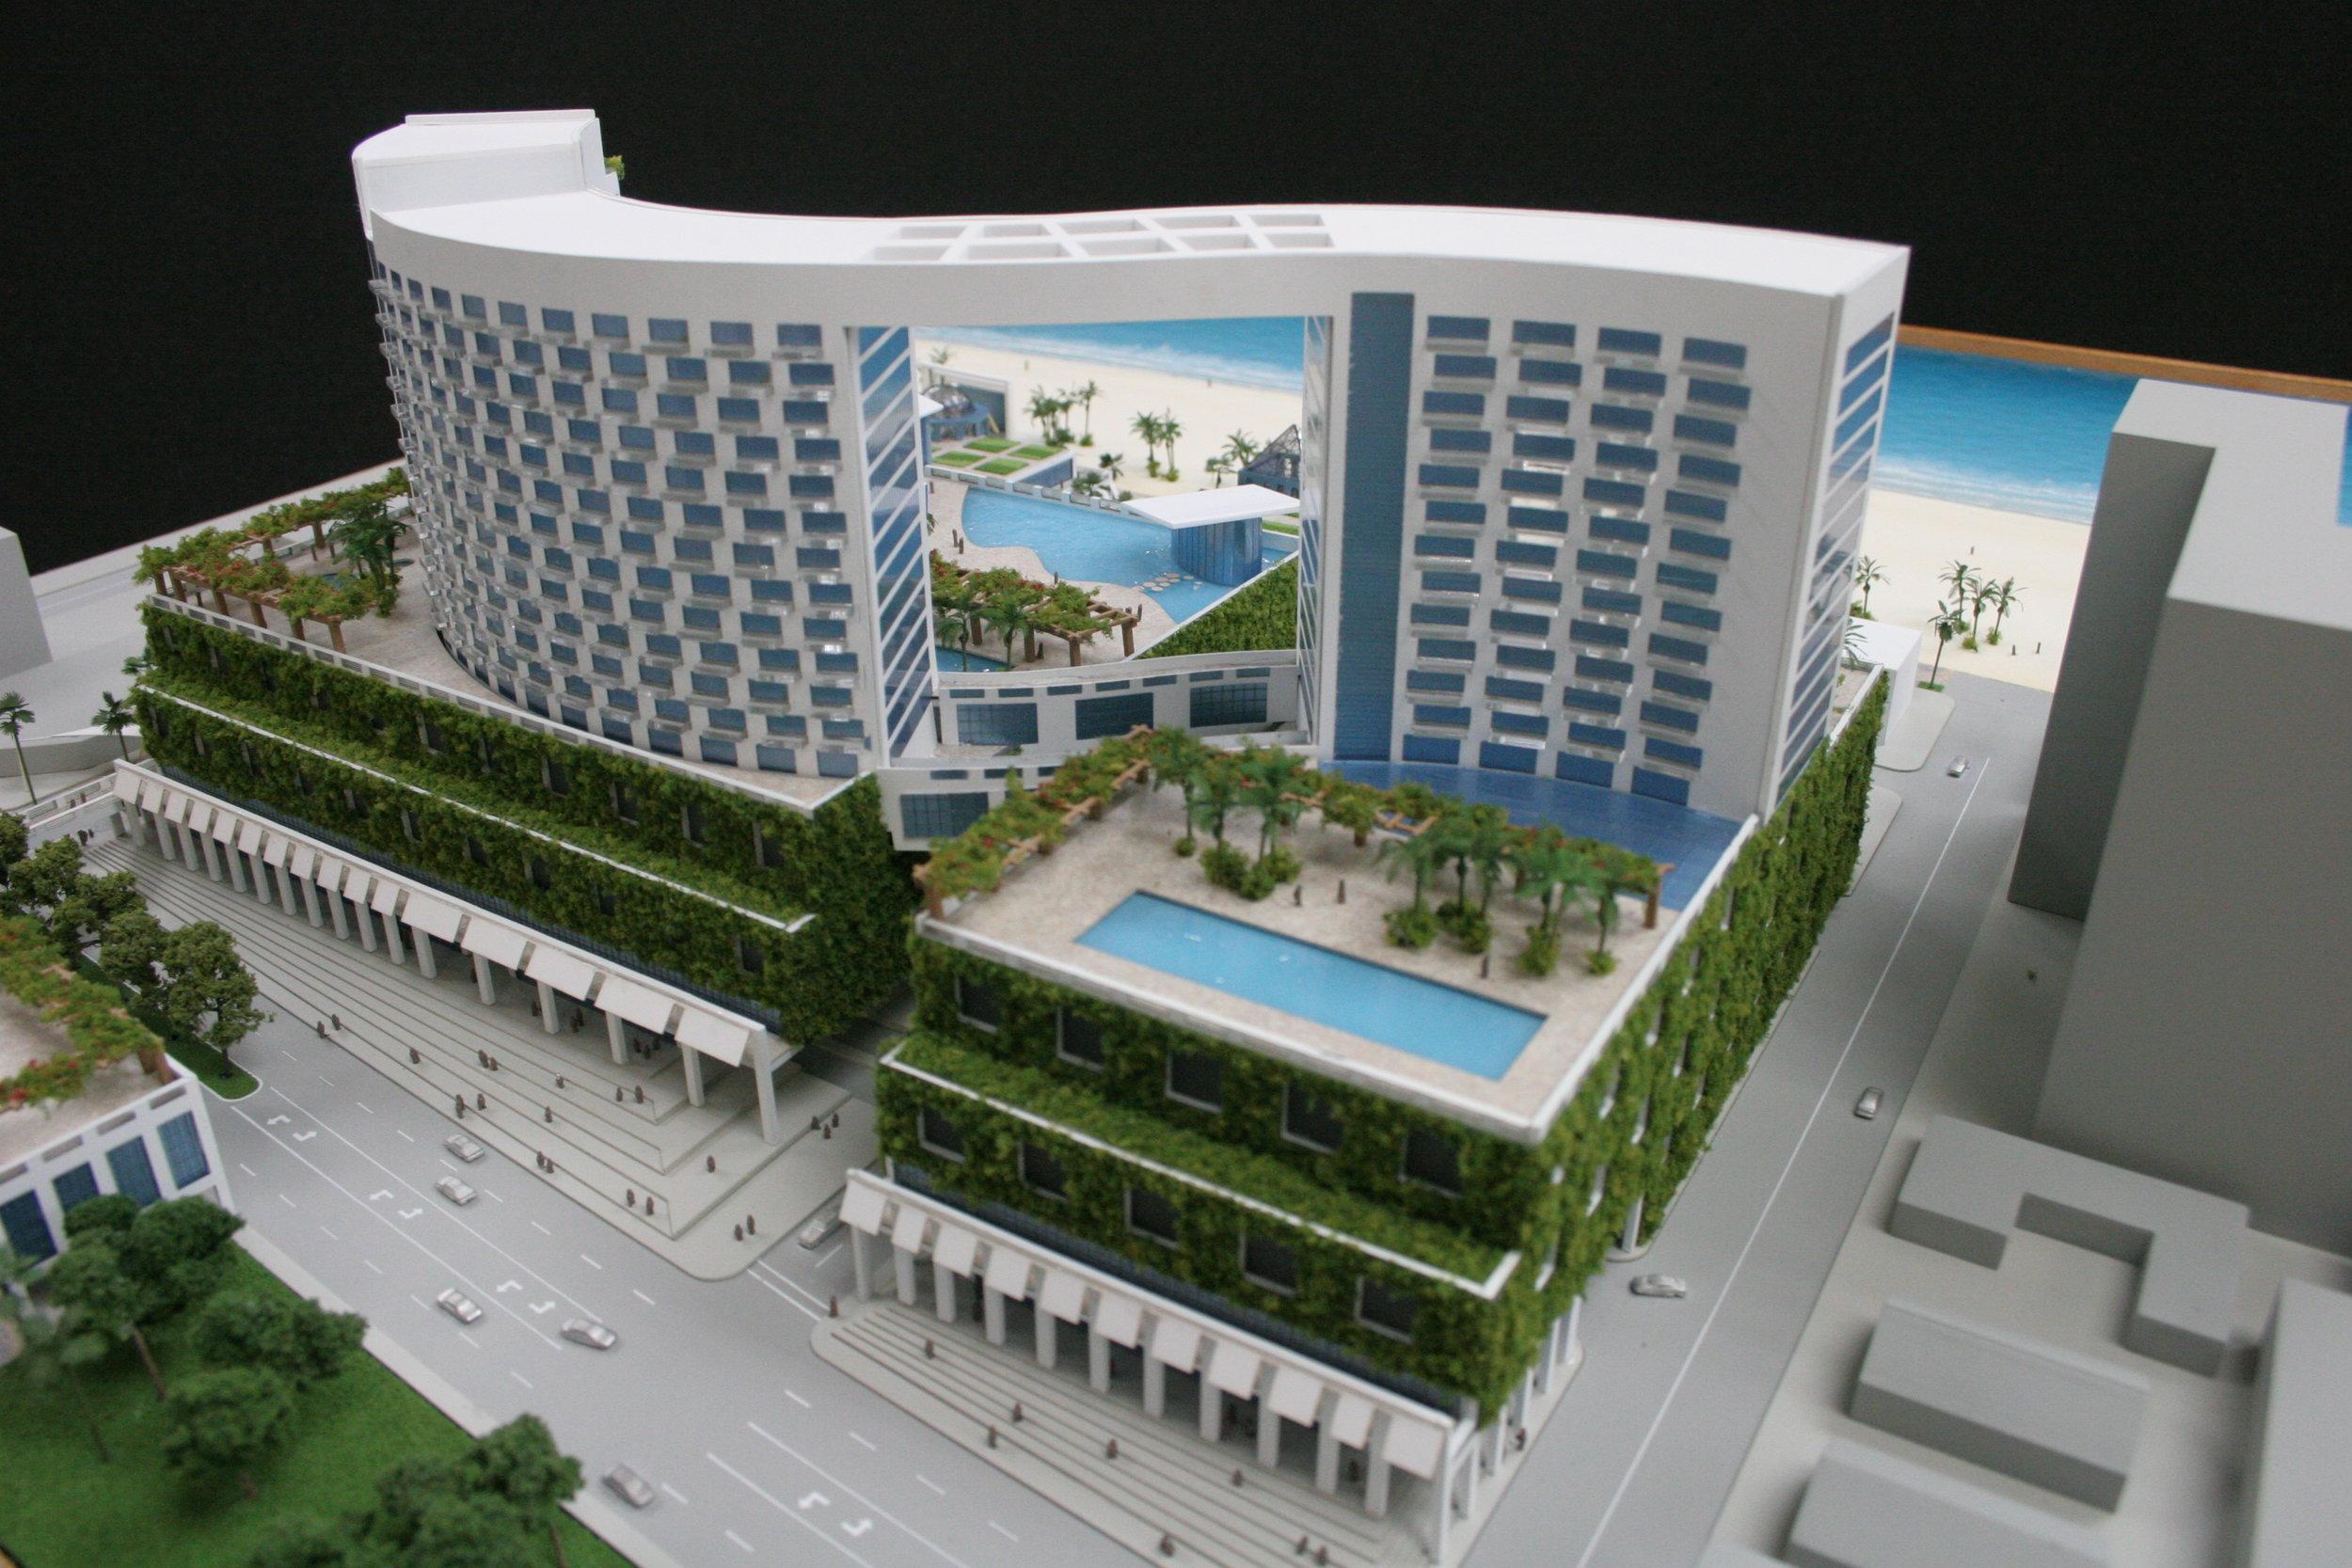 Hotel | Miami Beach, FL | Architect: Arquitectonica